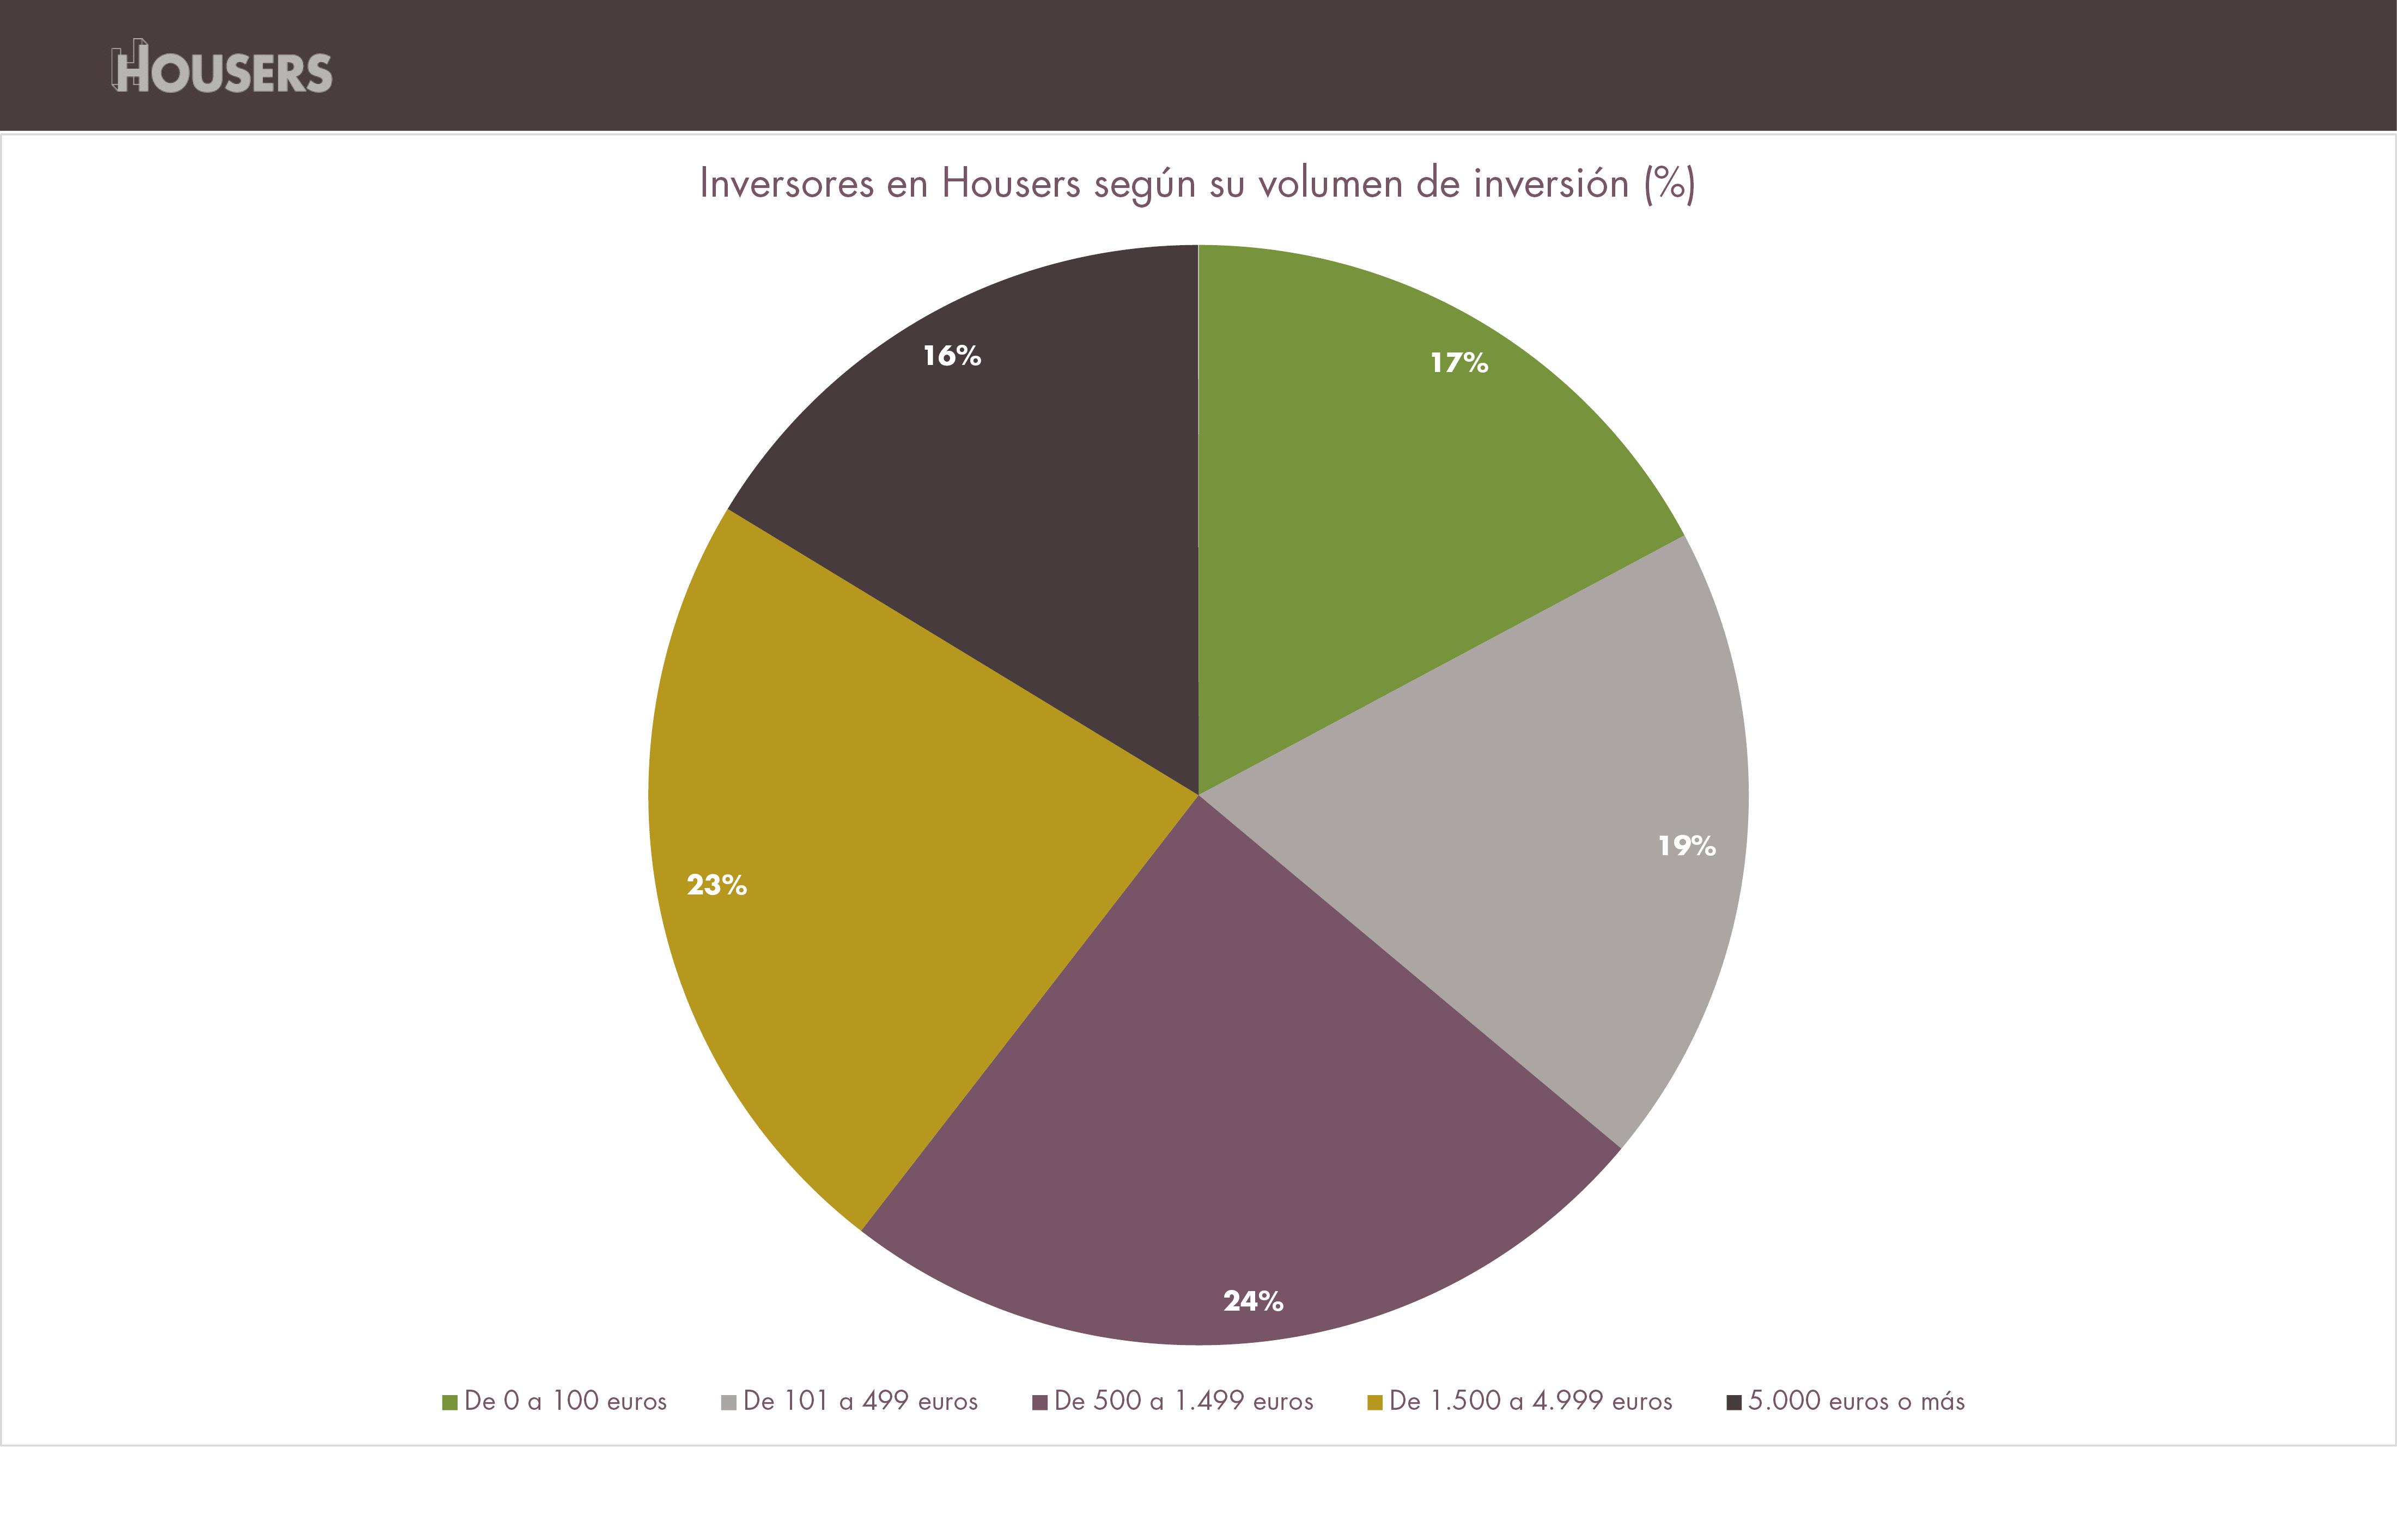 datos housers diciembre 2016 inversores segun volumen inversion